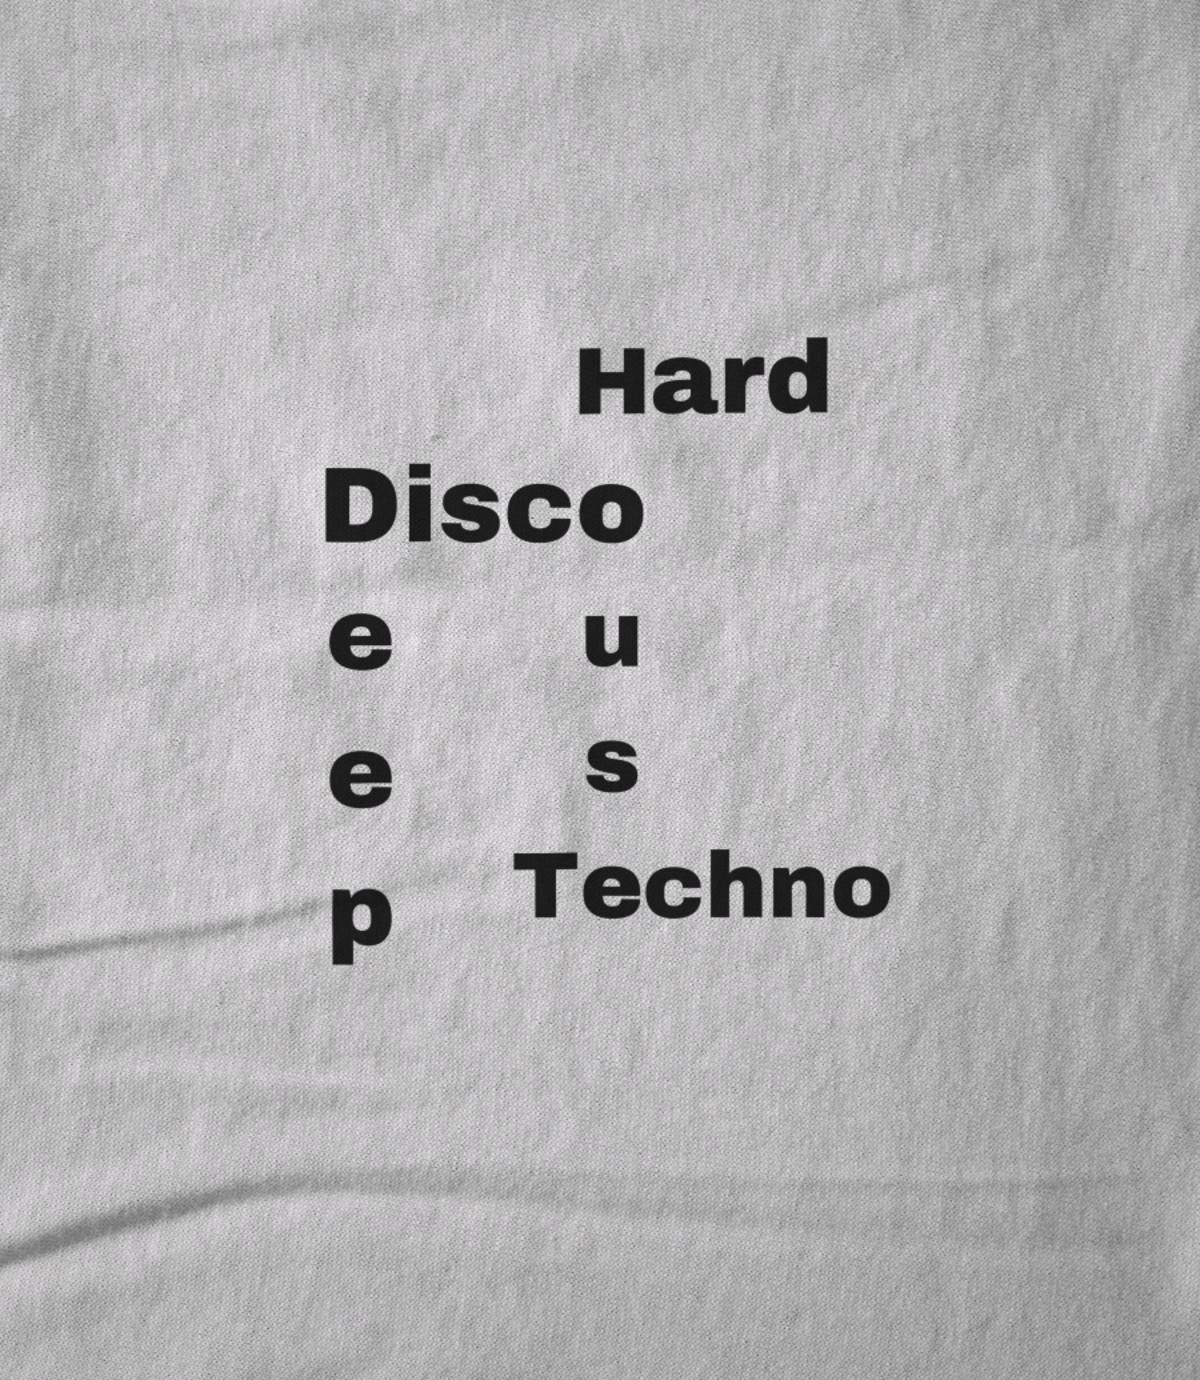 Beau3tiful disco   deep house   hard techno 1545636918